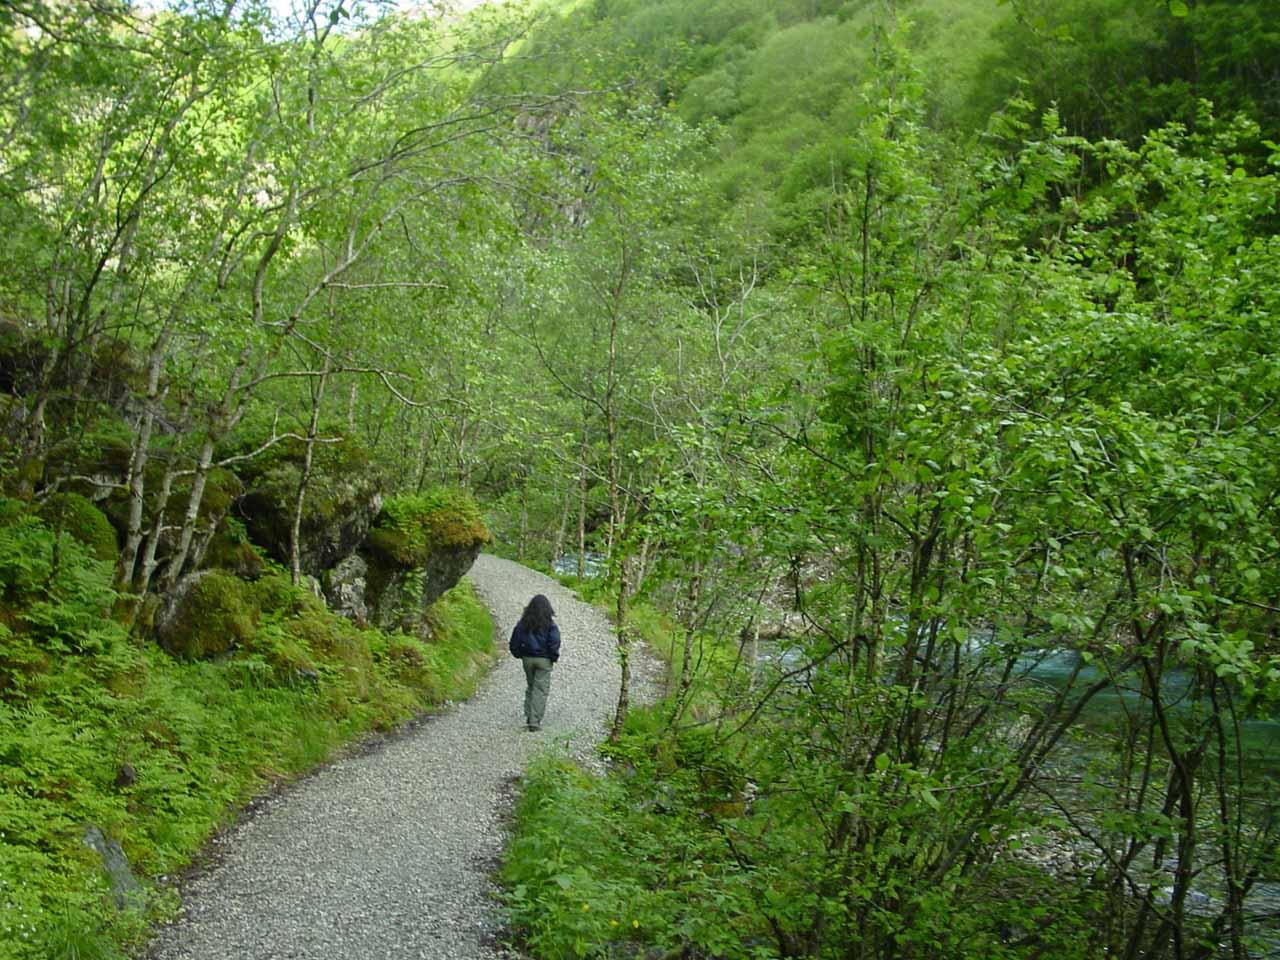 Julie on the well-developed walk to the base of Stalheimsfossen